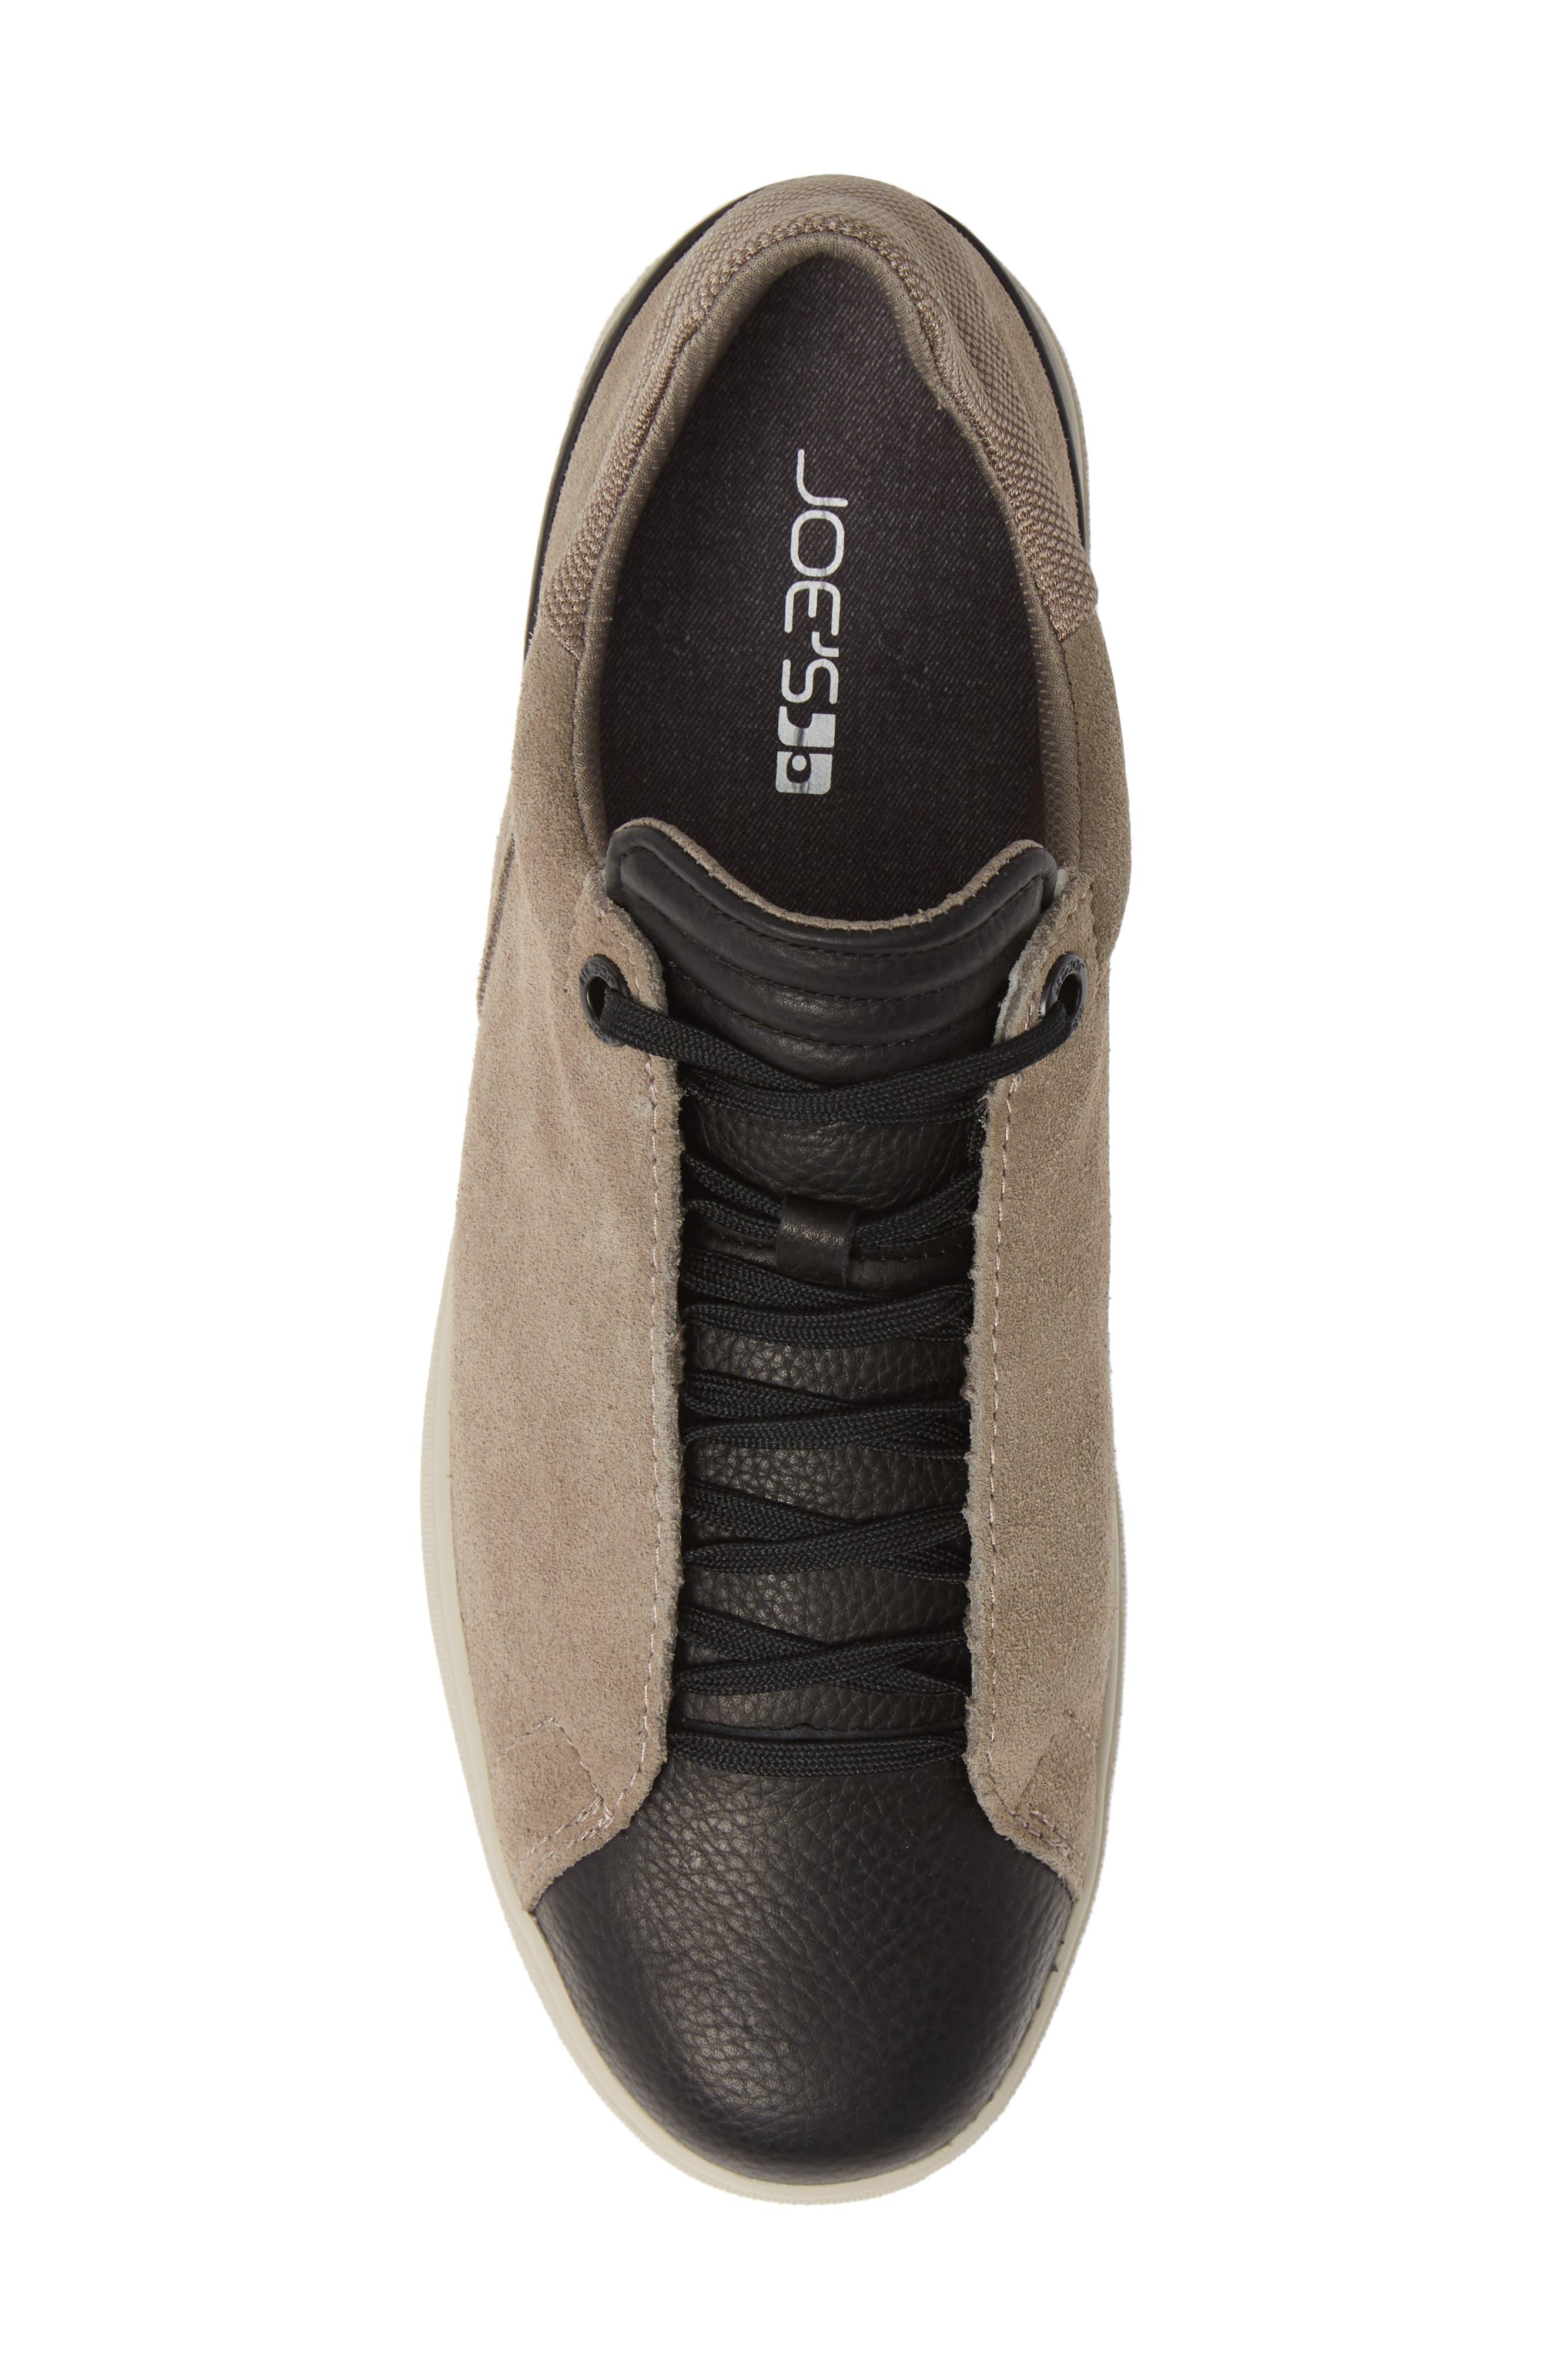 Joe Papa Low Top Sneaker,                             Alternate thumbnail 5, color,                             STONE/ BLACK